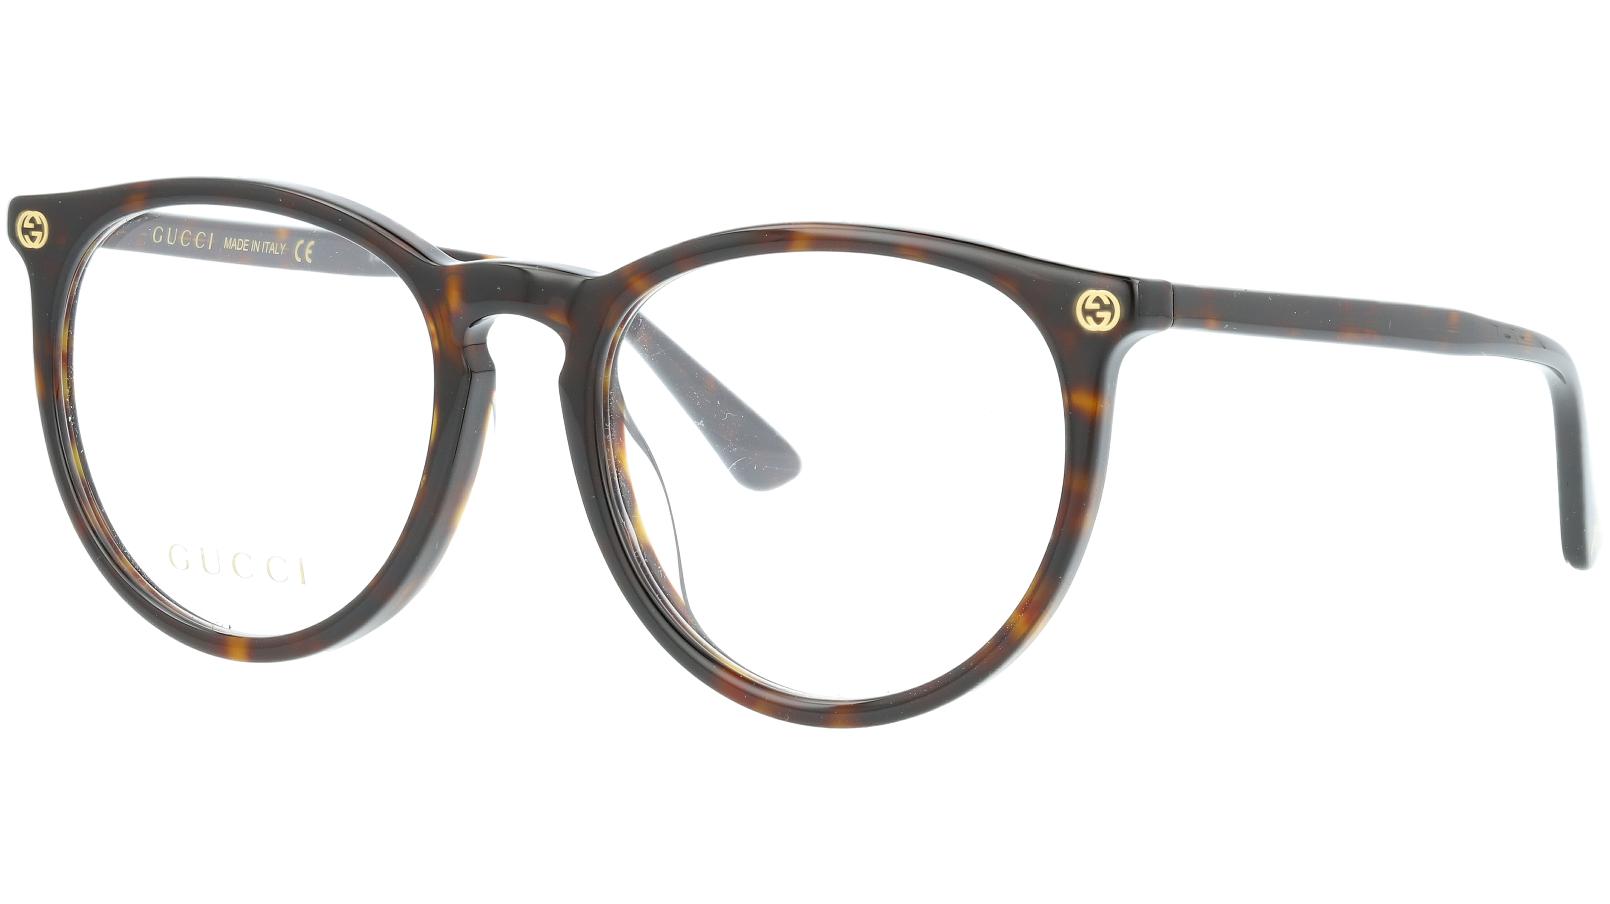 GUCCI GG0027OA 002 52 AVANA Glasses